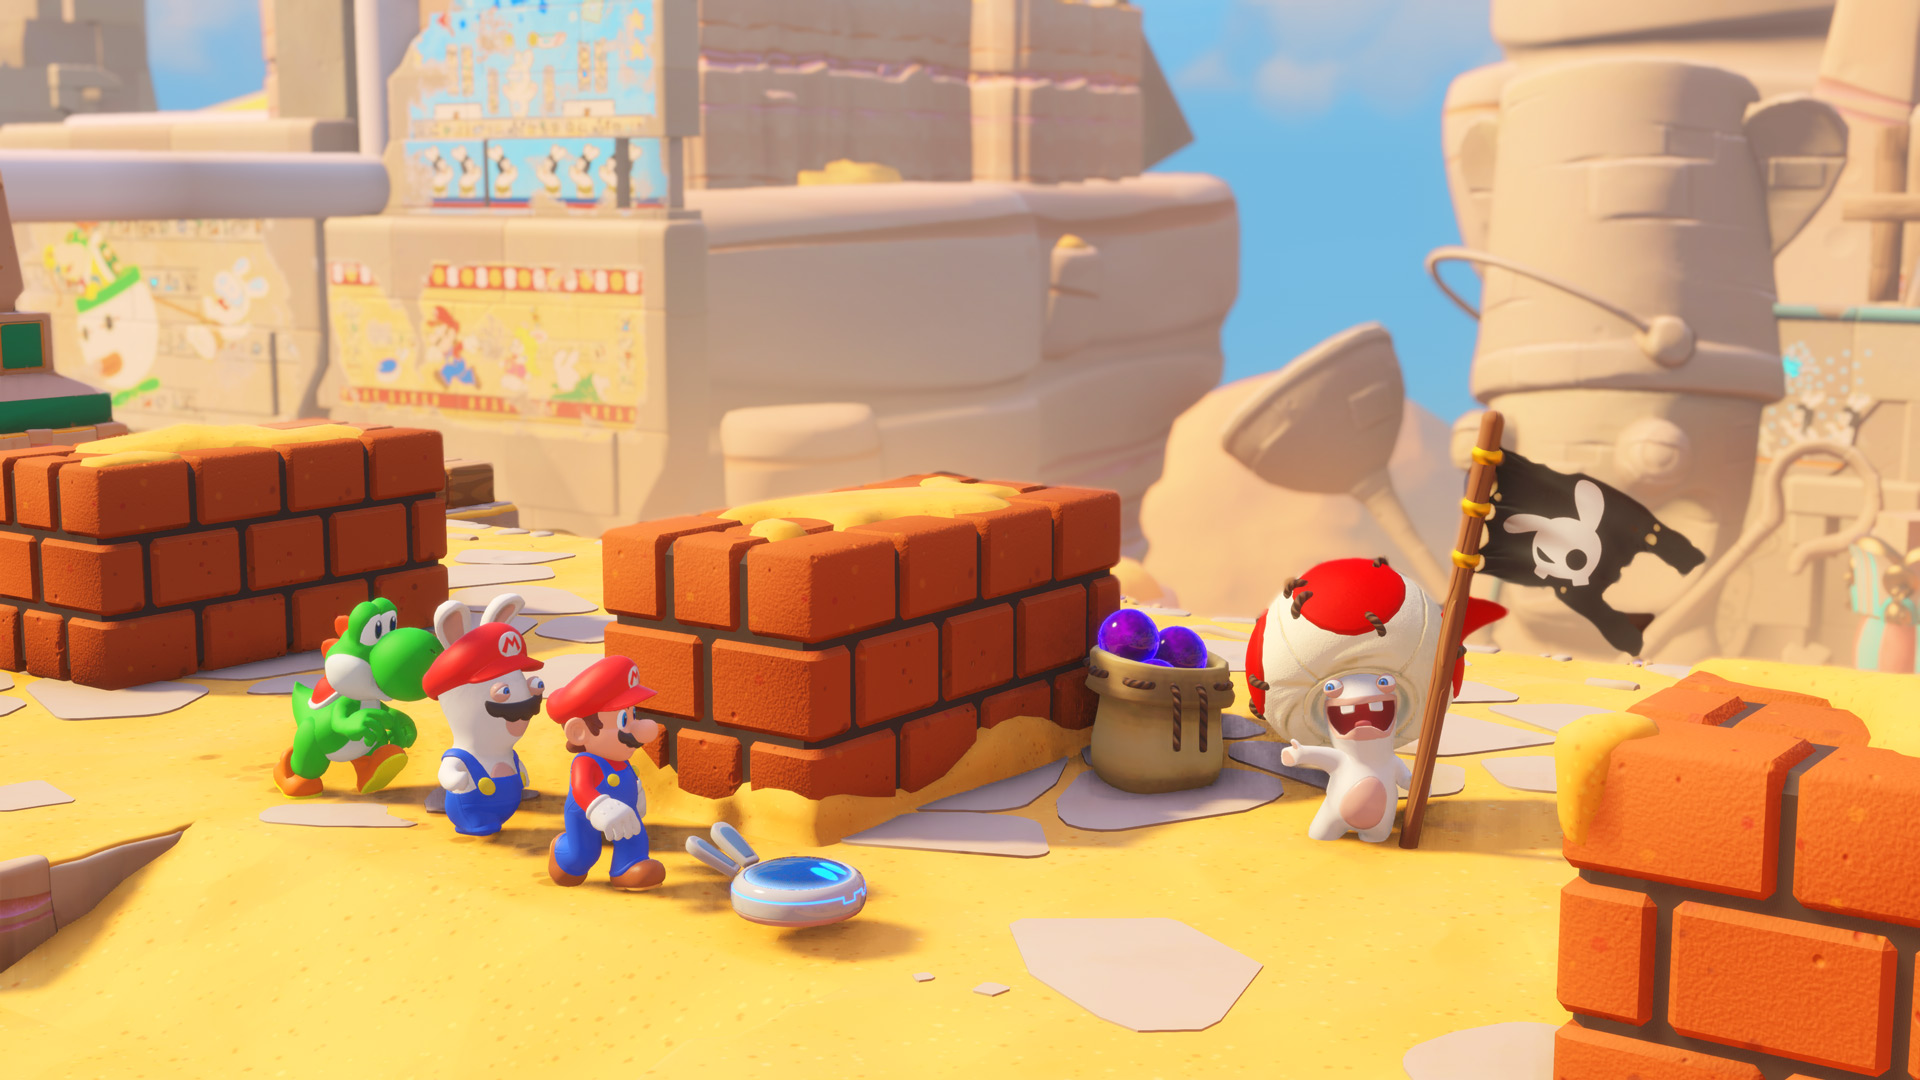 Drawn rabbid healing Mario modern element Game Rabbids